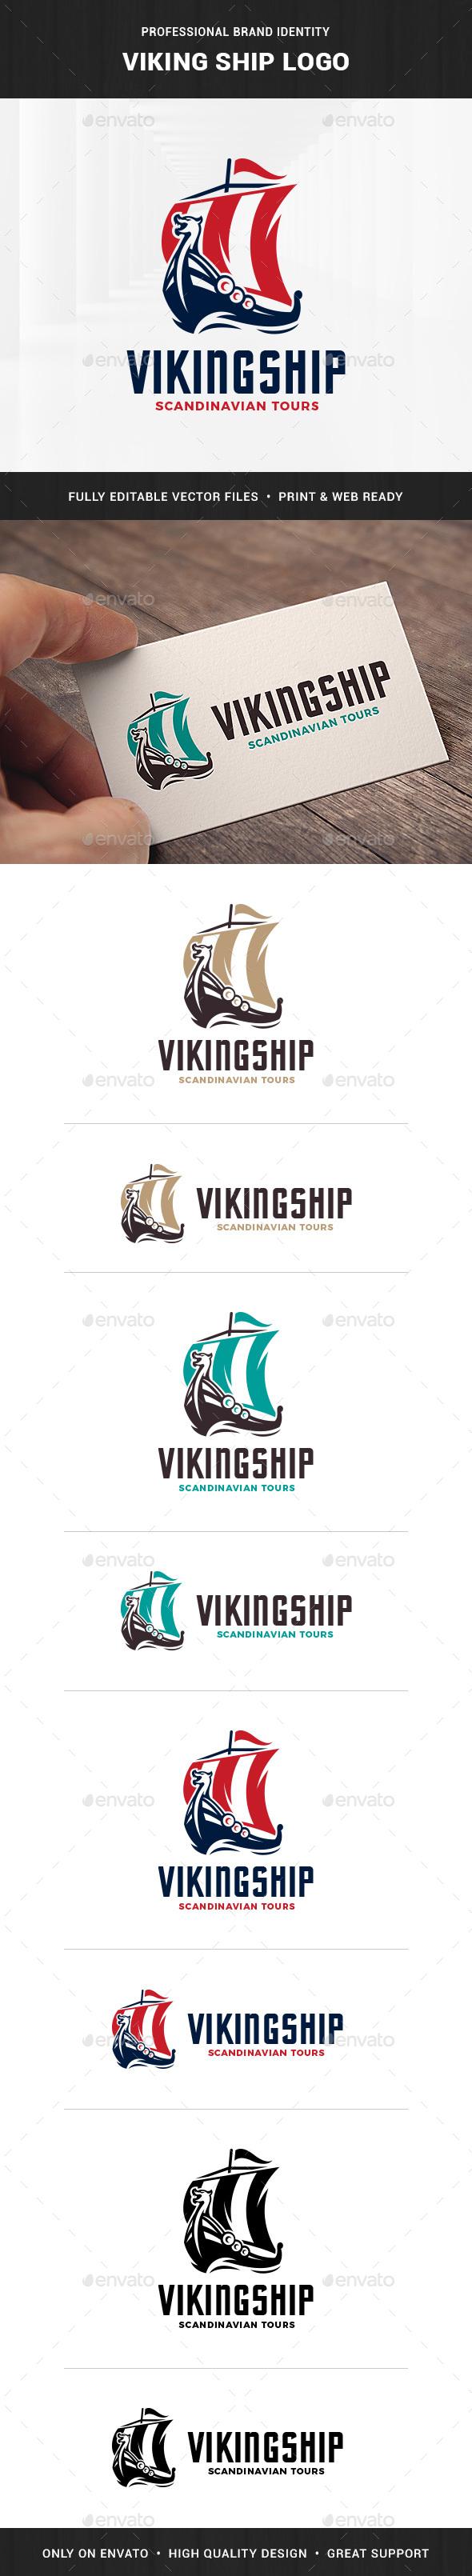 Viking Ship Logo Template